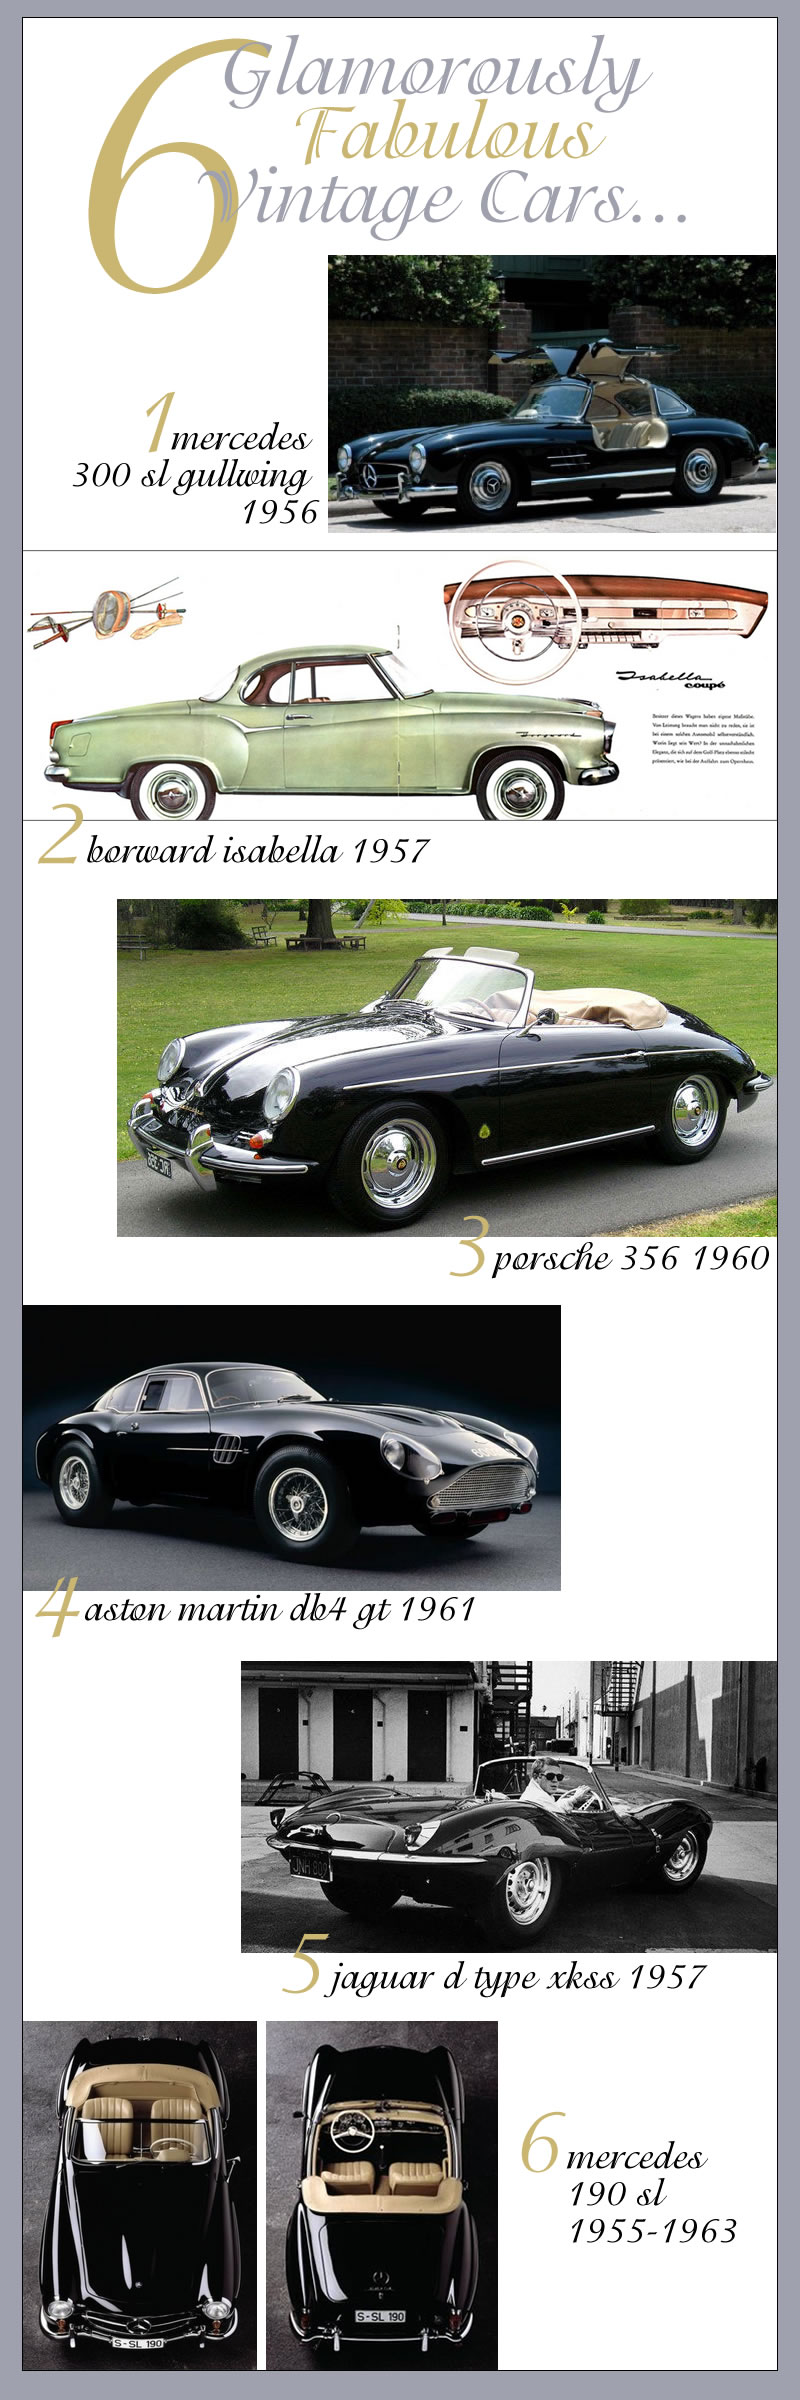 6 fabulous glamorous vintage cars